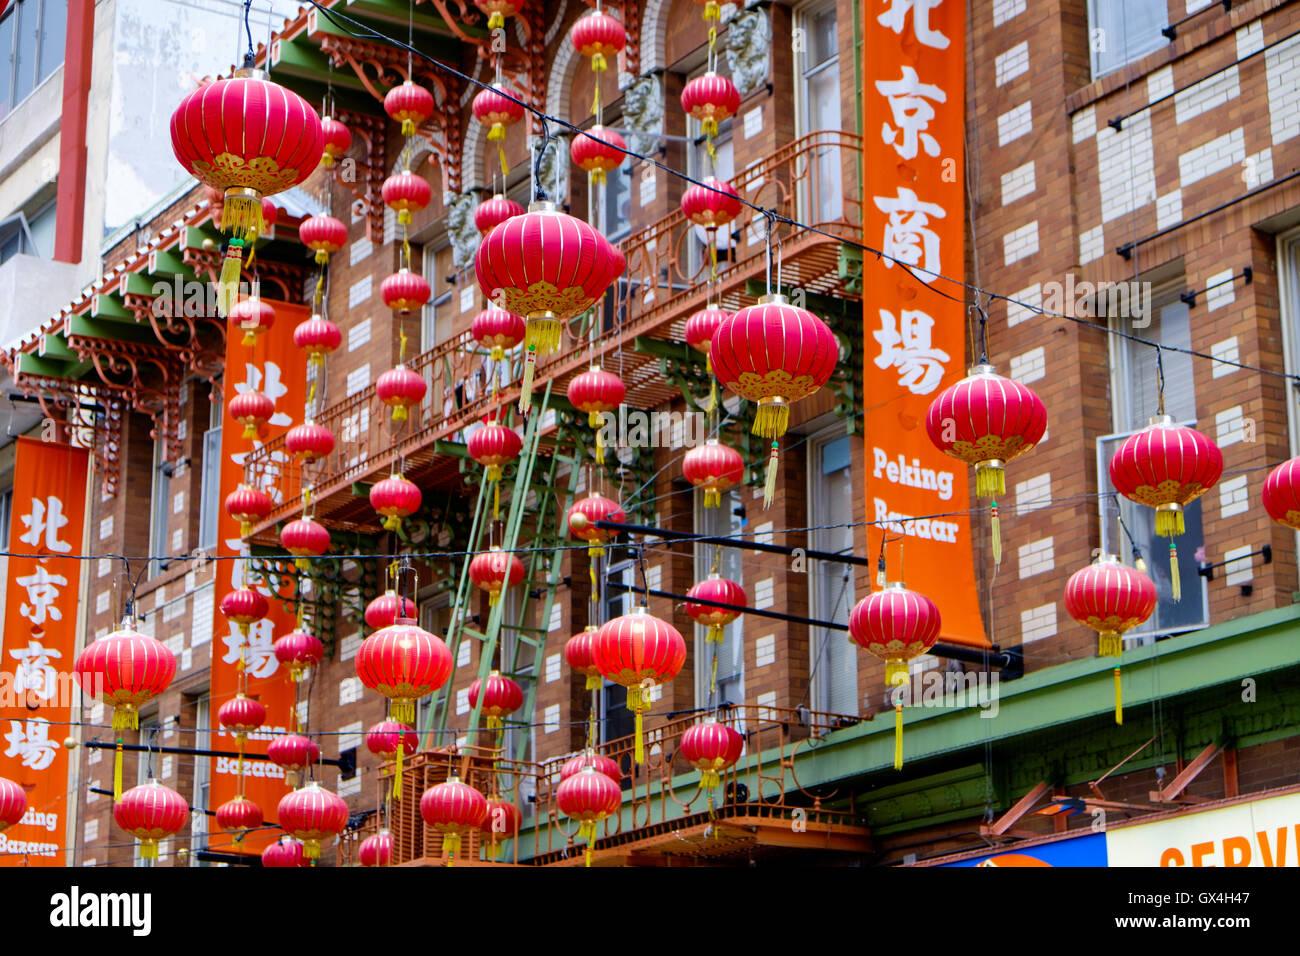 Red lanterns outside Peking Bazaar in China Town San Francisco, California Stock Photo